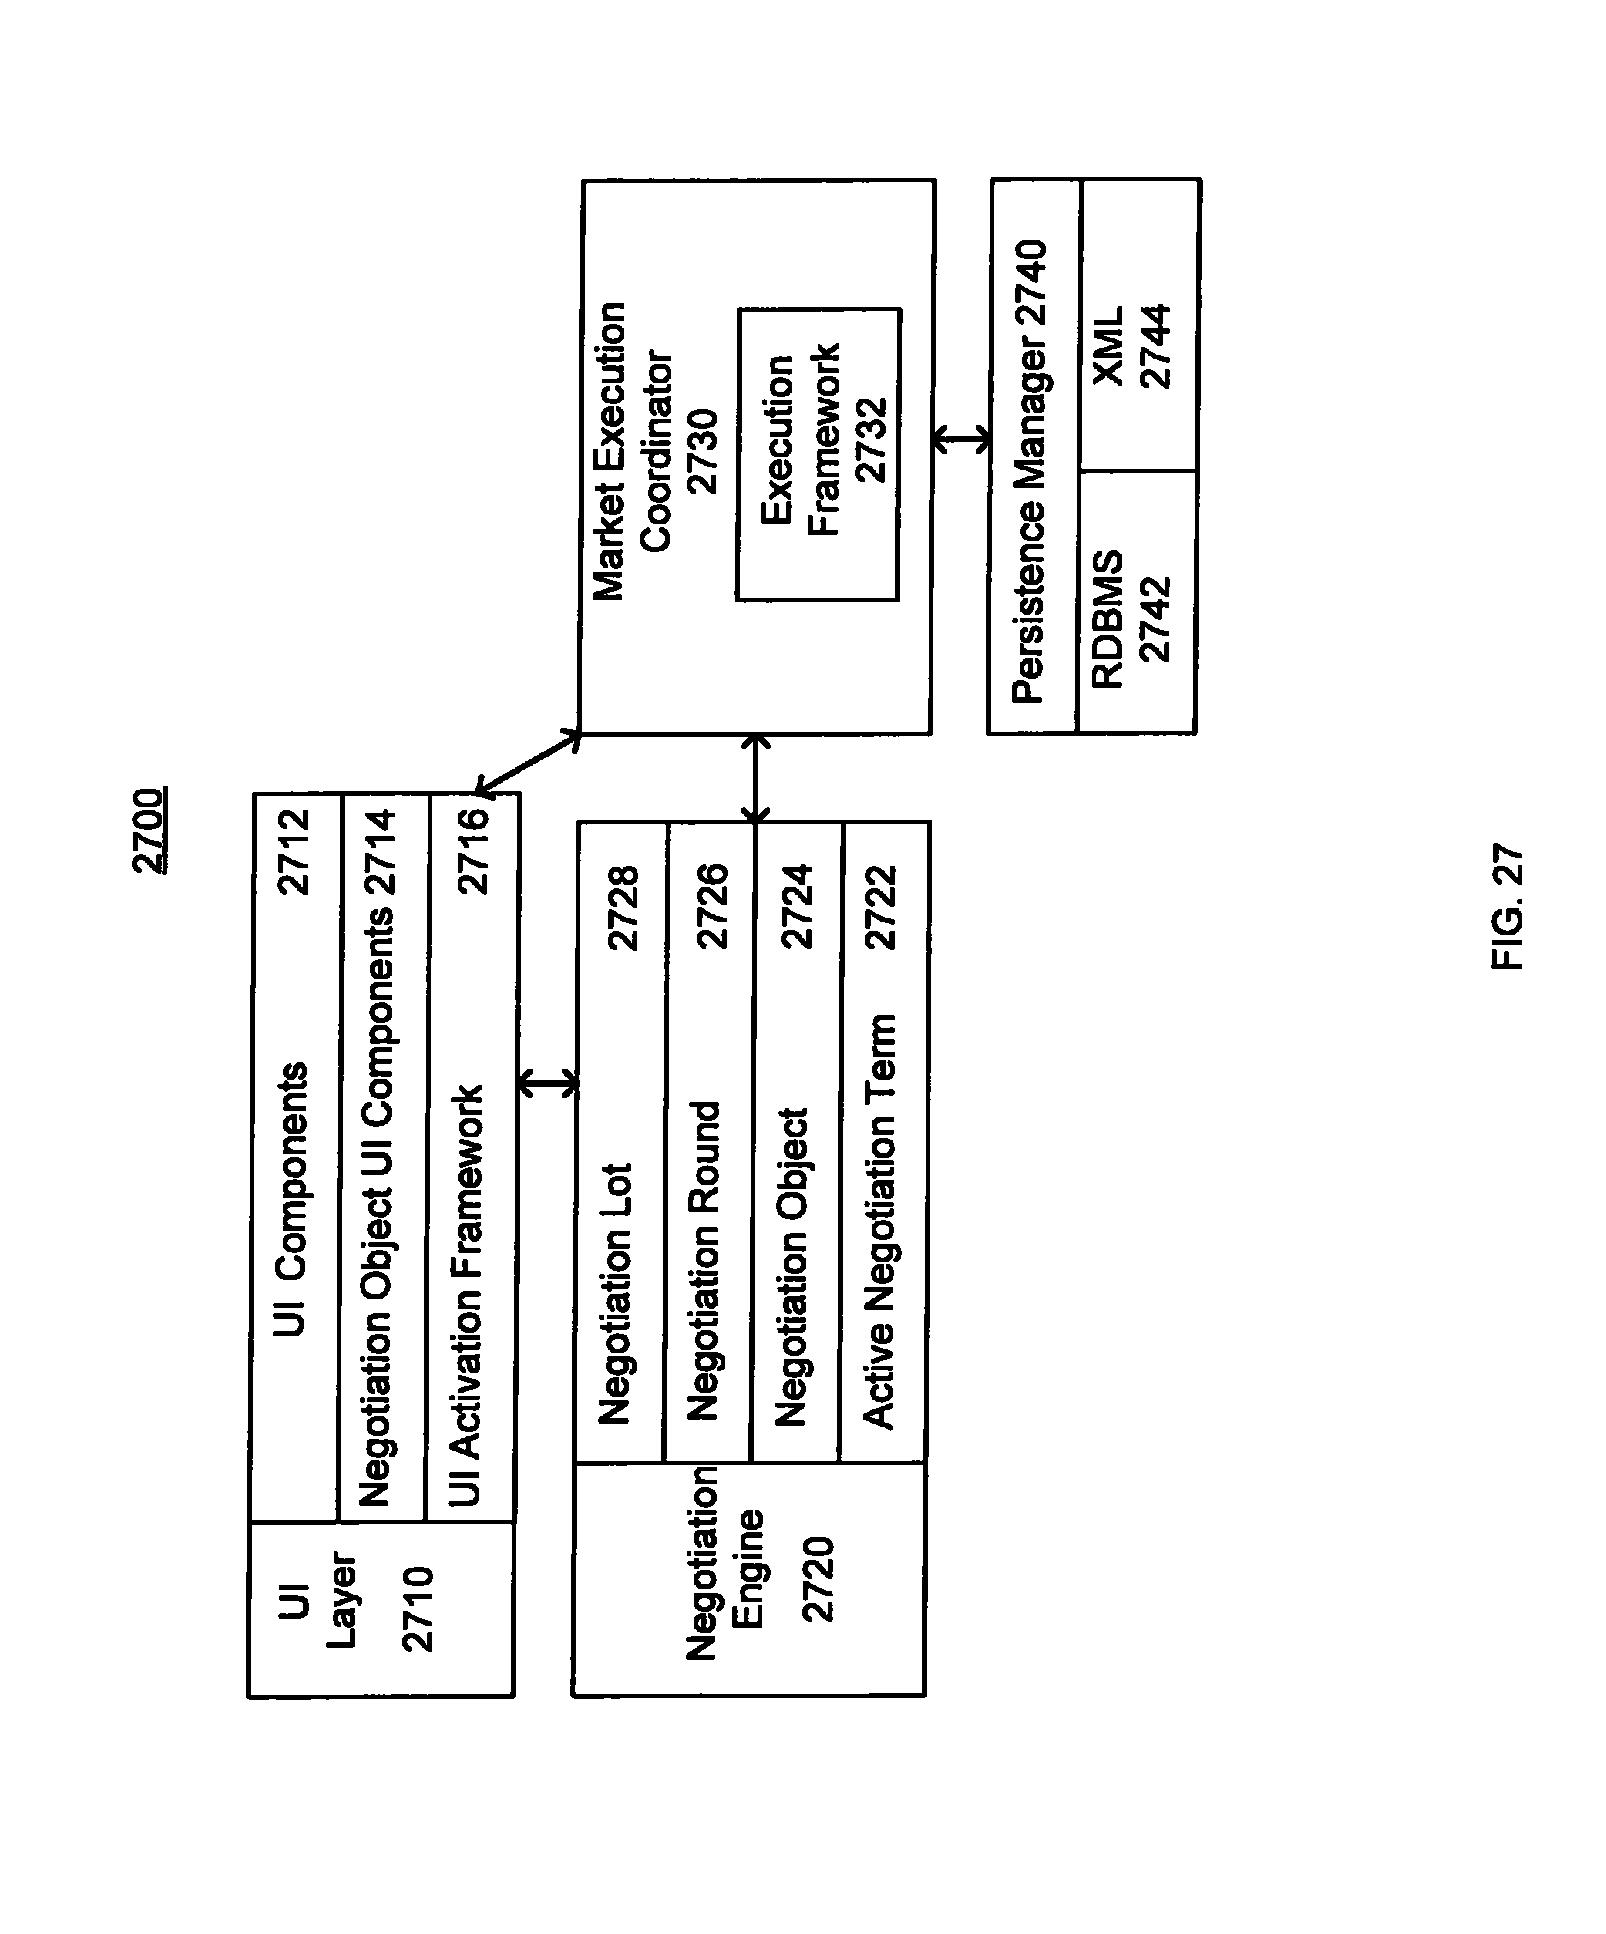 Patent US 8,712,858 B2